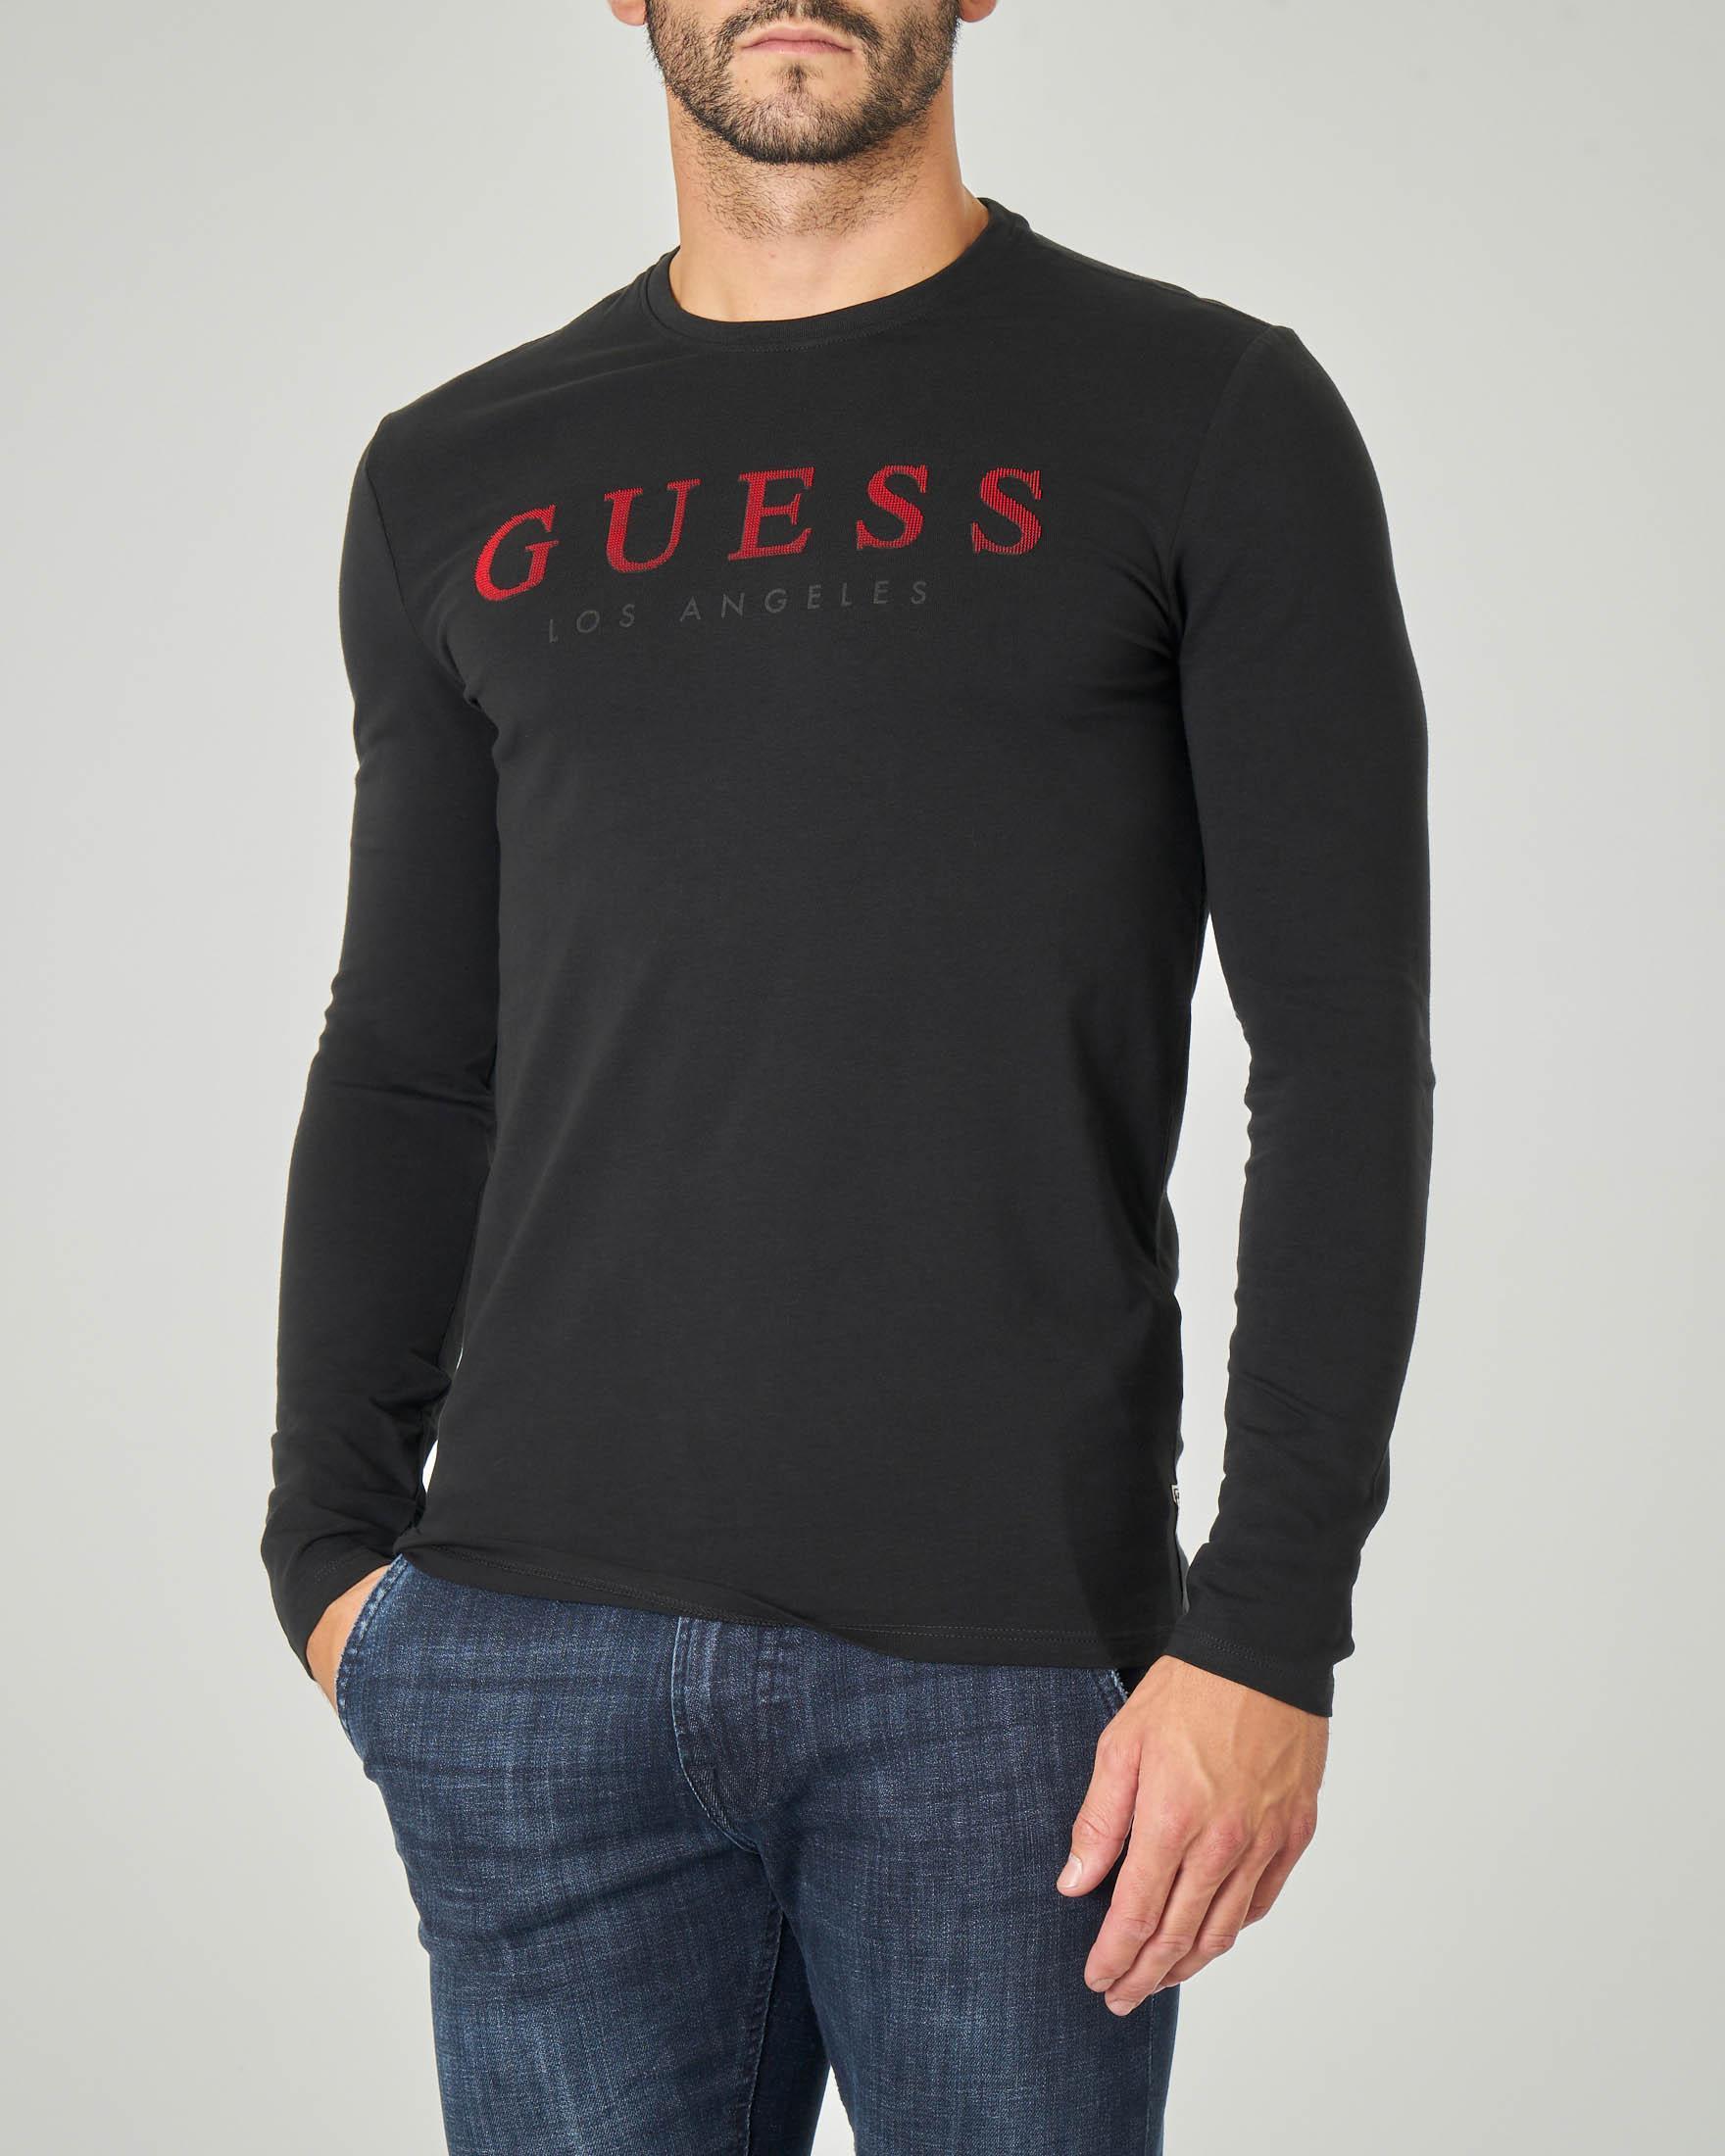 T-shirt nera manica lunga con logo rosso ricamato